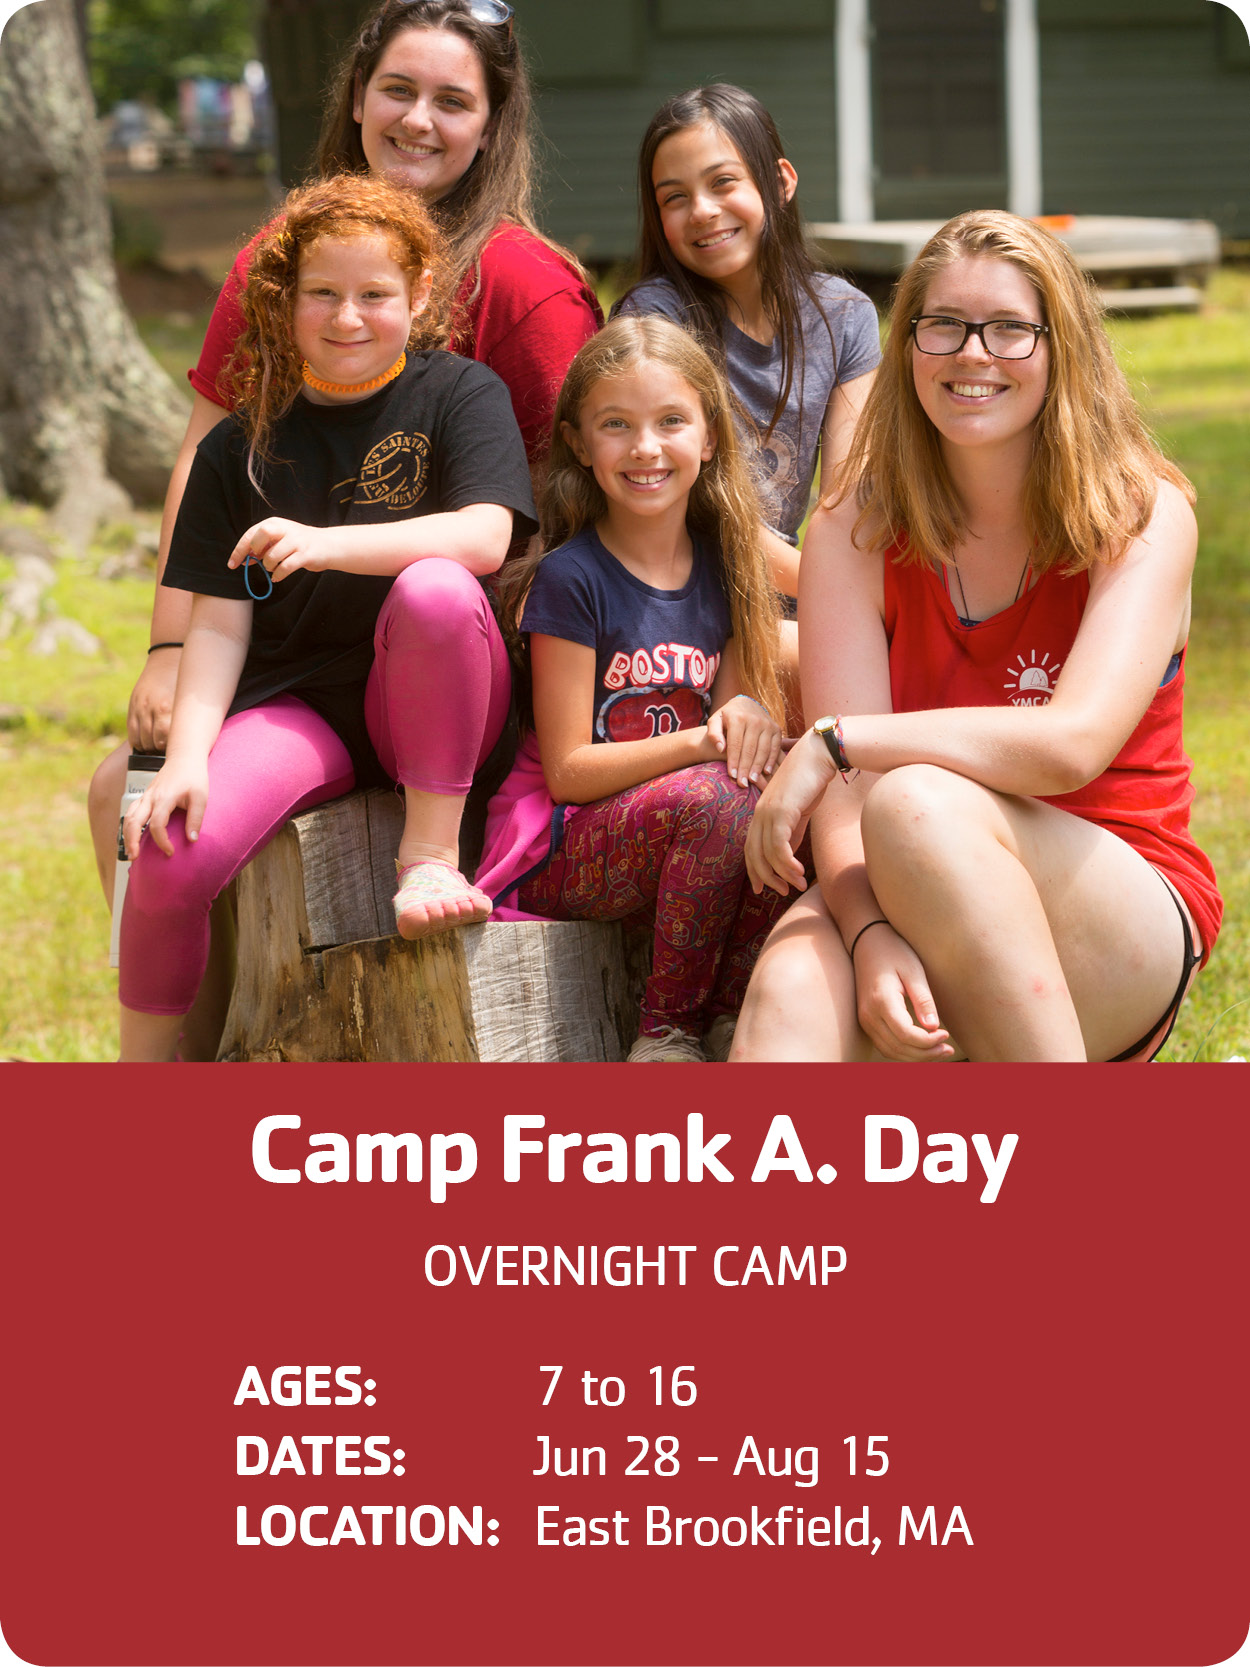 Camp Frank A. Day freshmen campers